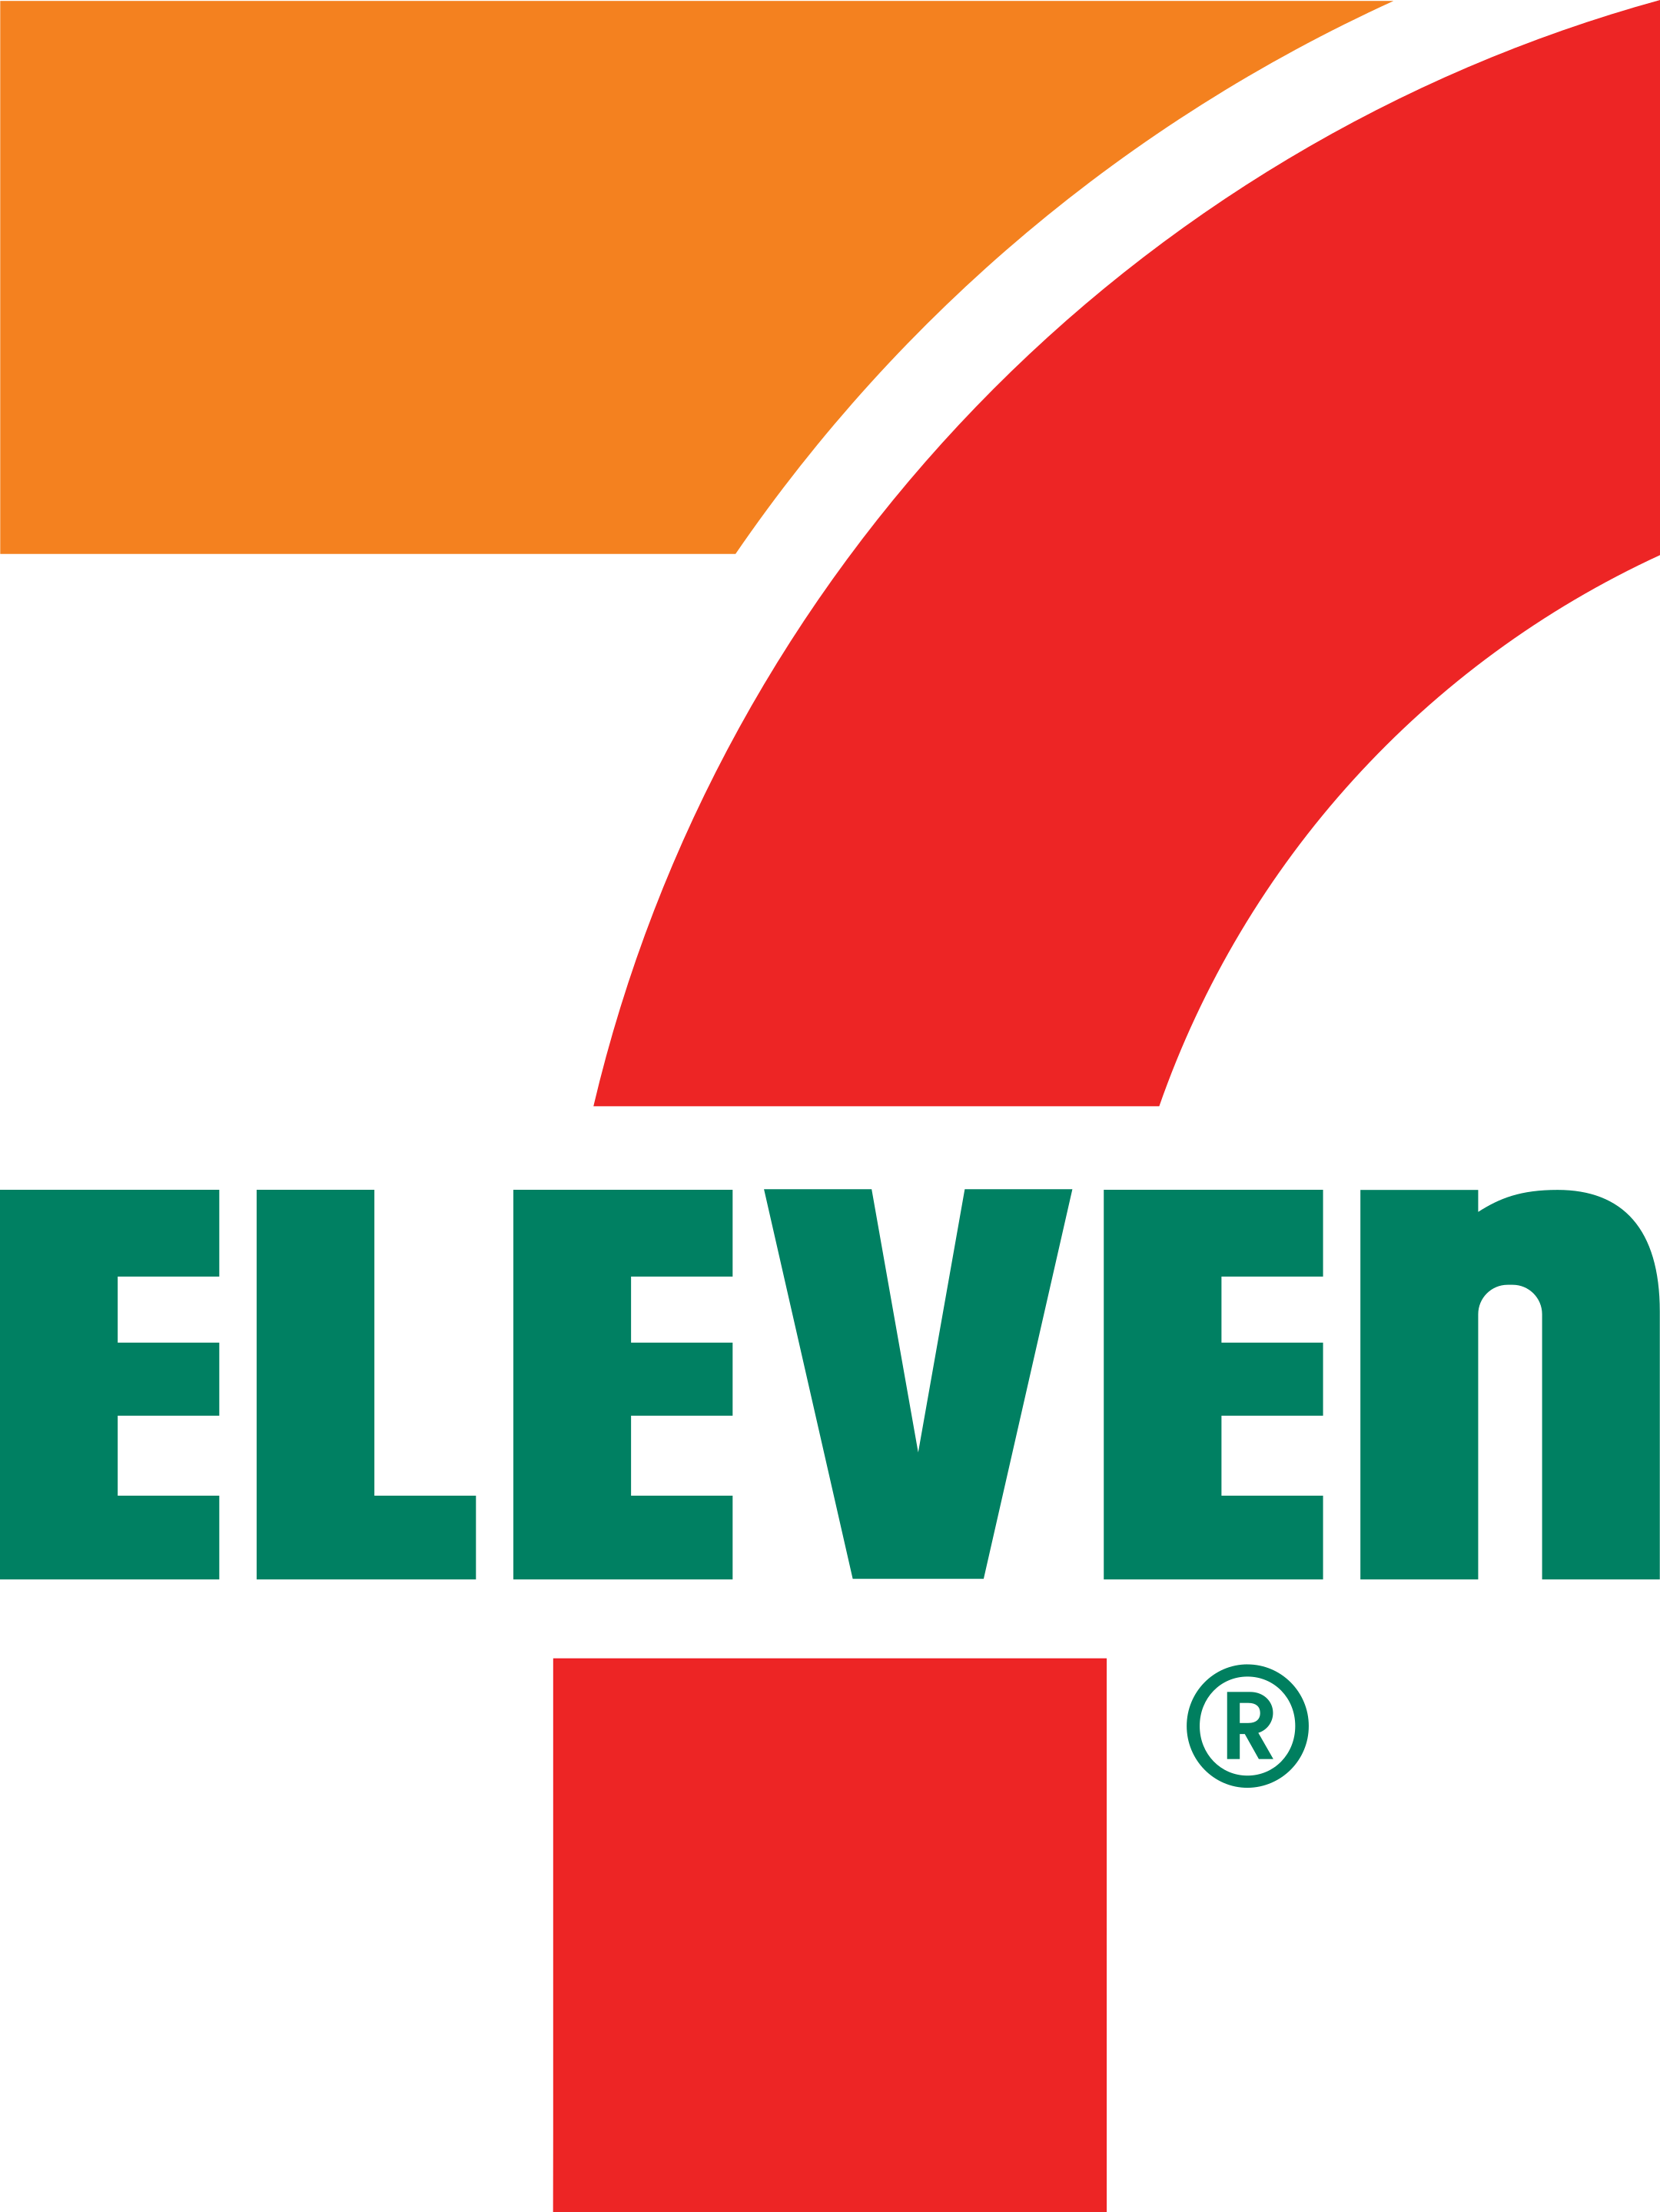 7 eleven logo 1 - 7-Eleven Logo